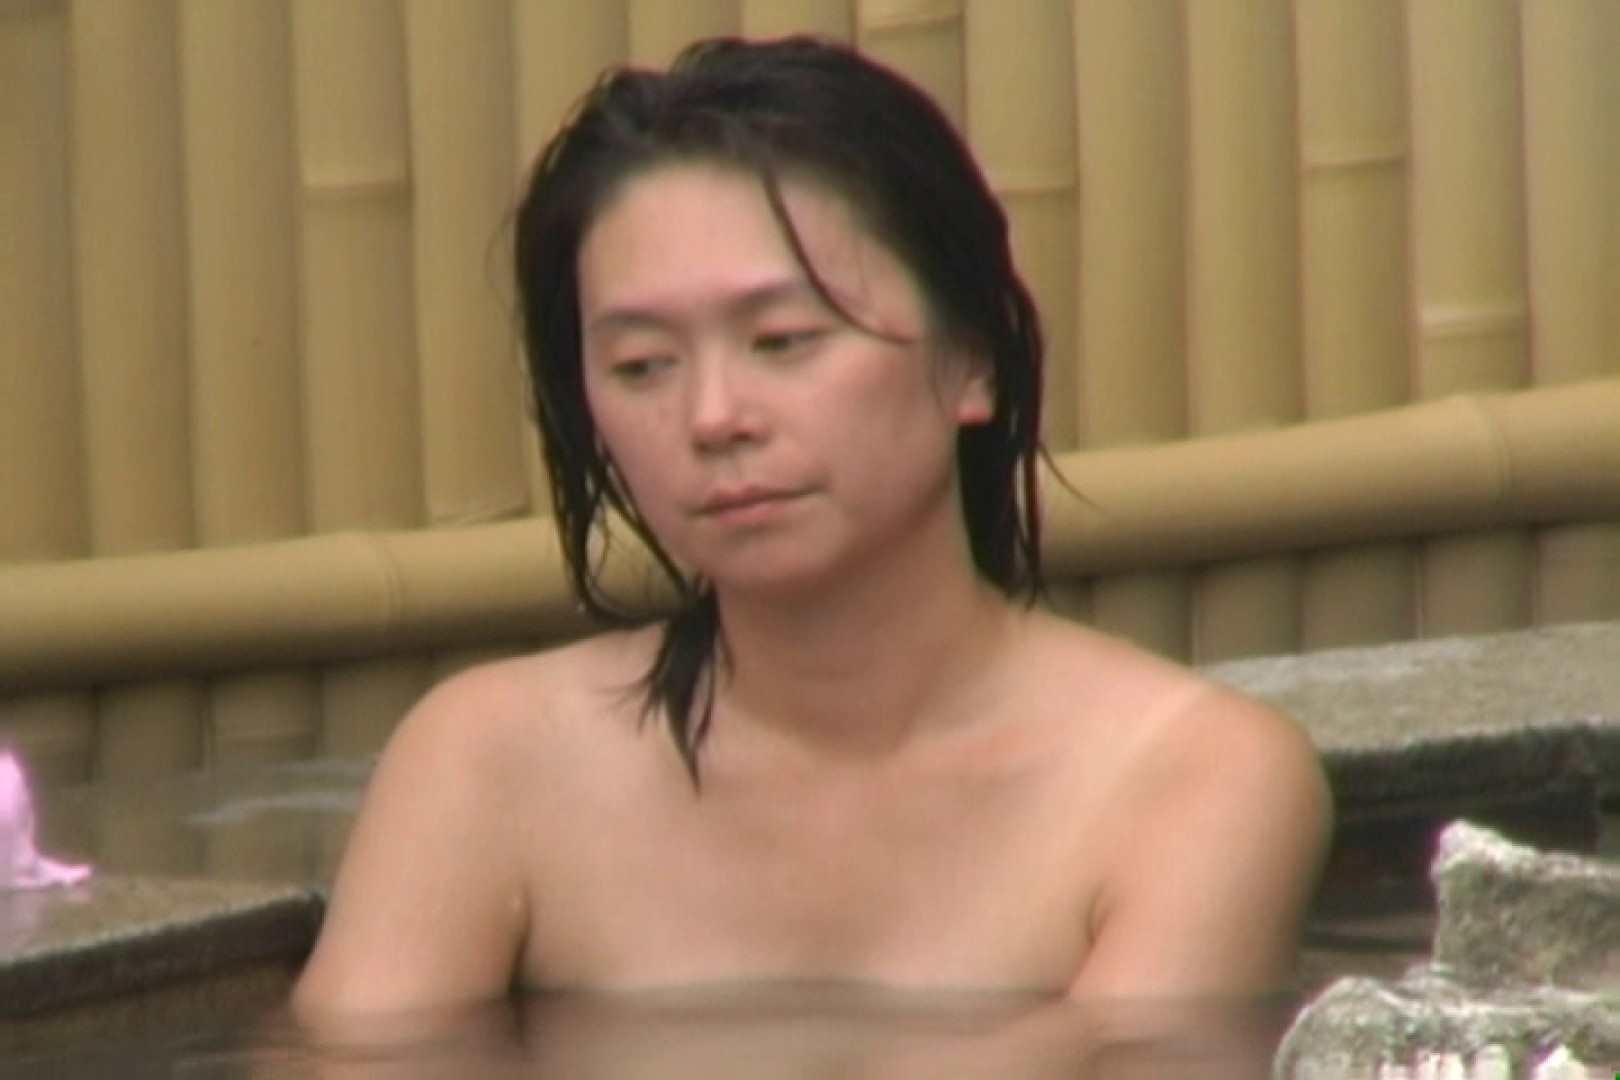 Aquaな露天風呂Vol.619 エッチな盗撮 ワレメ無修正動画無料 107pic 48